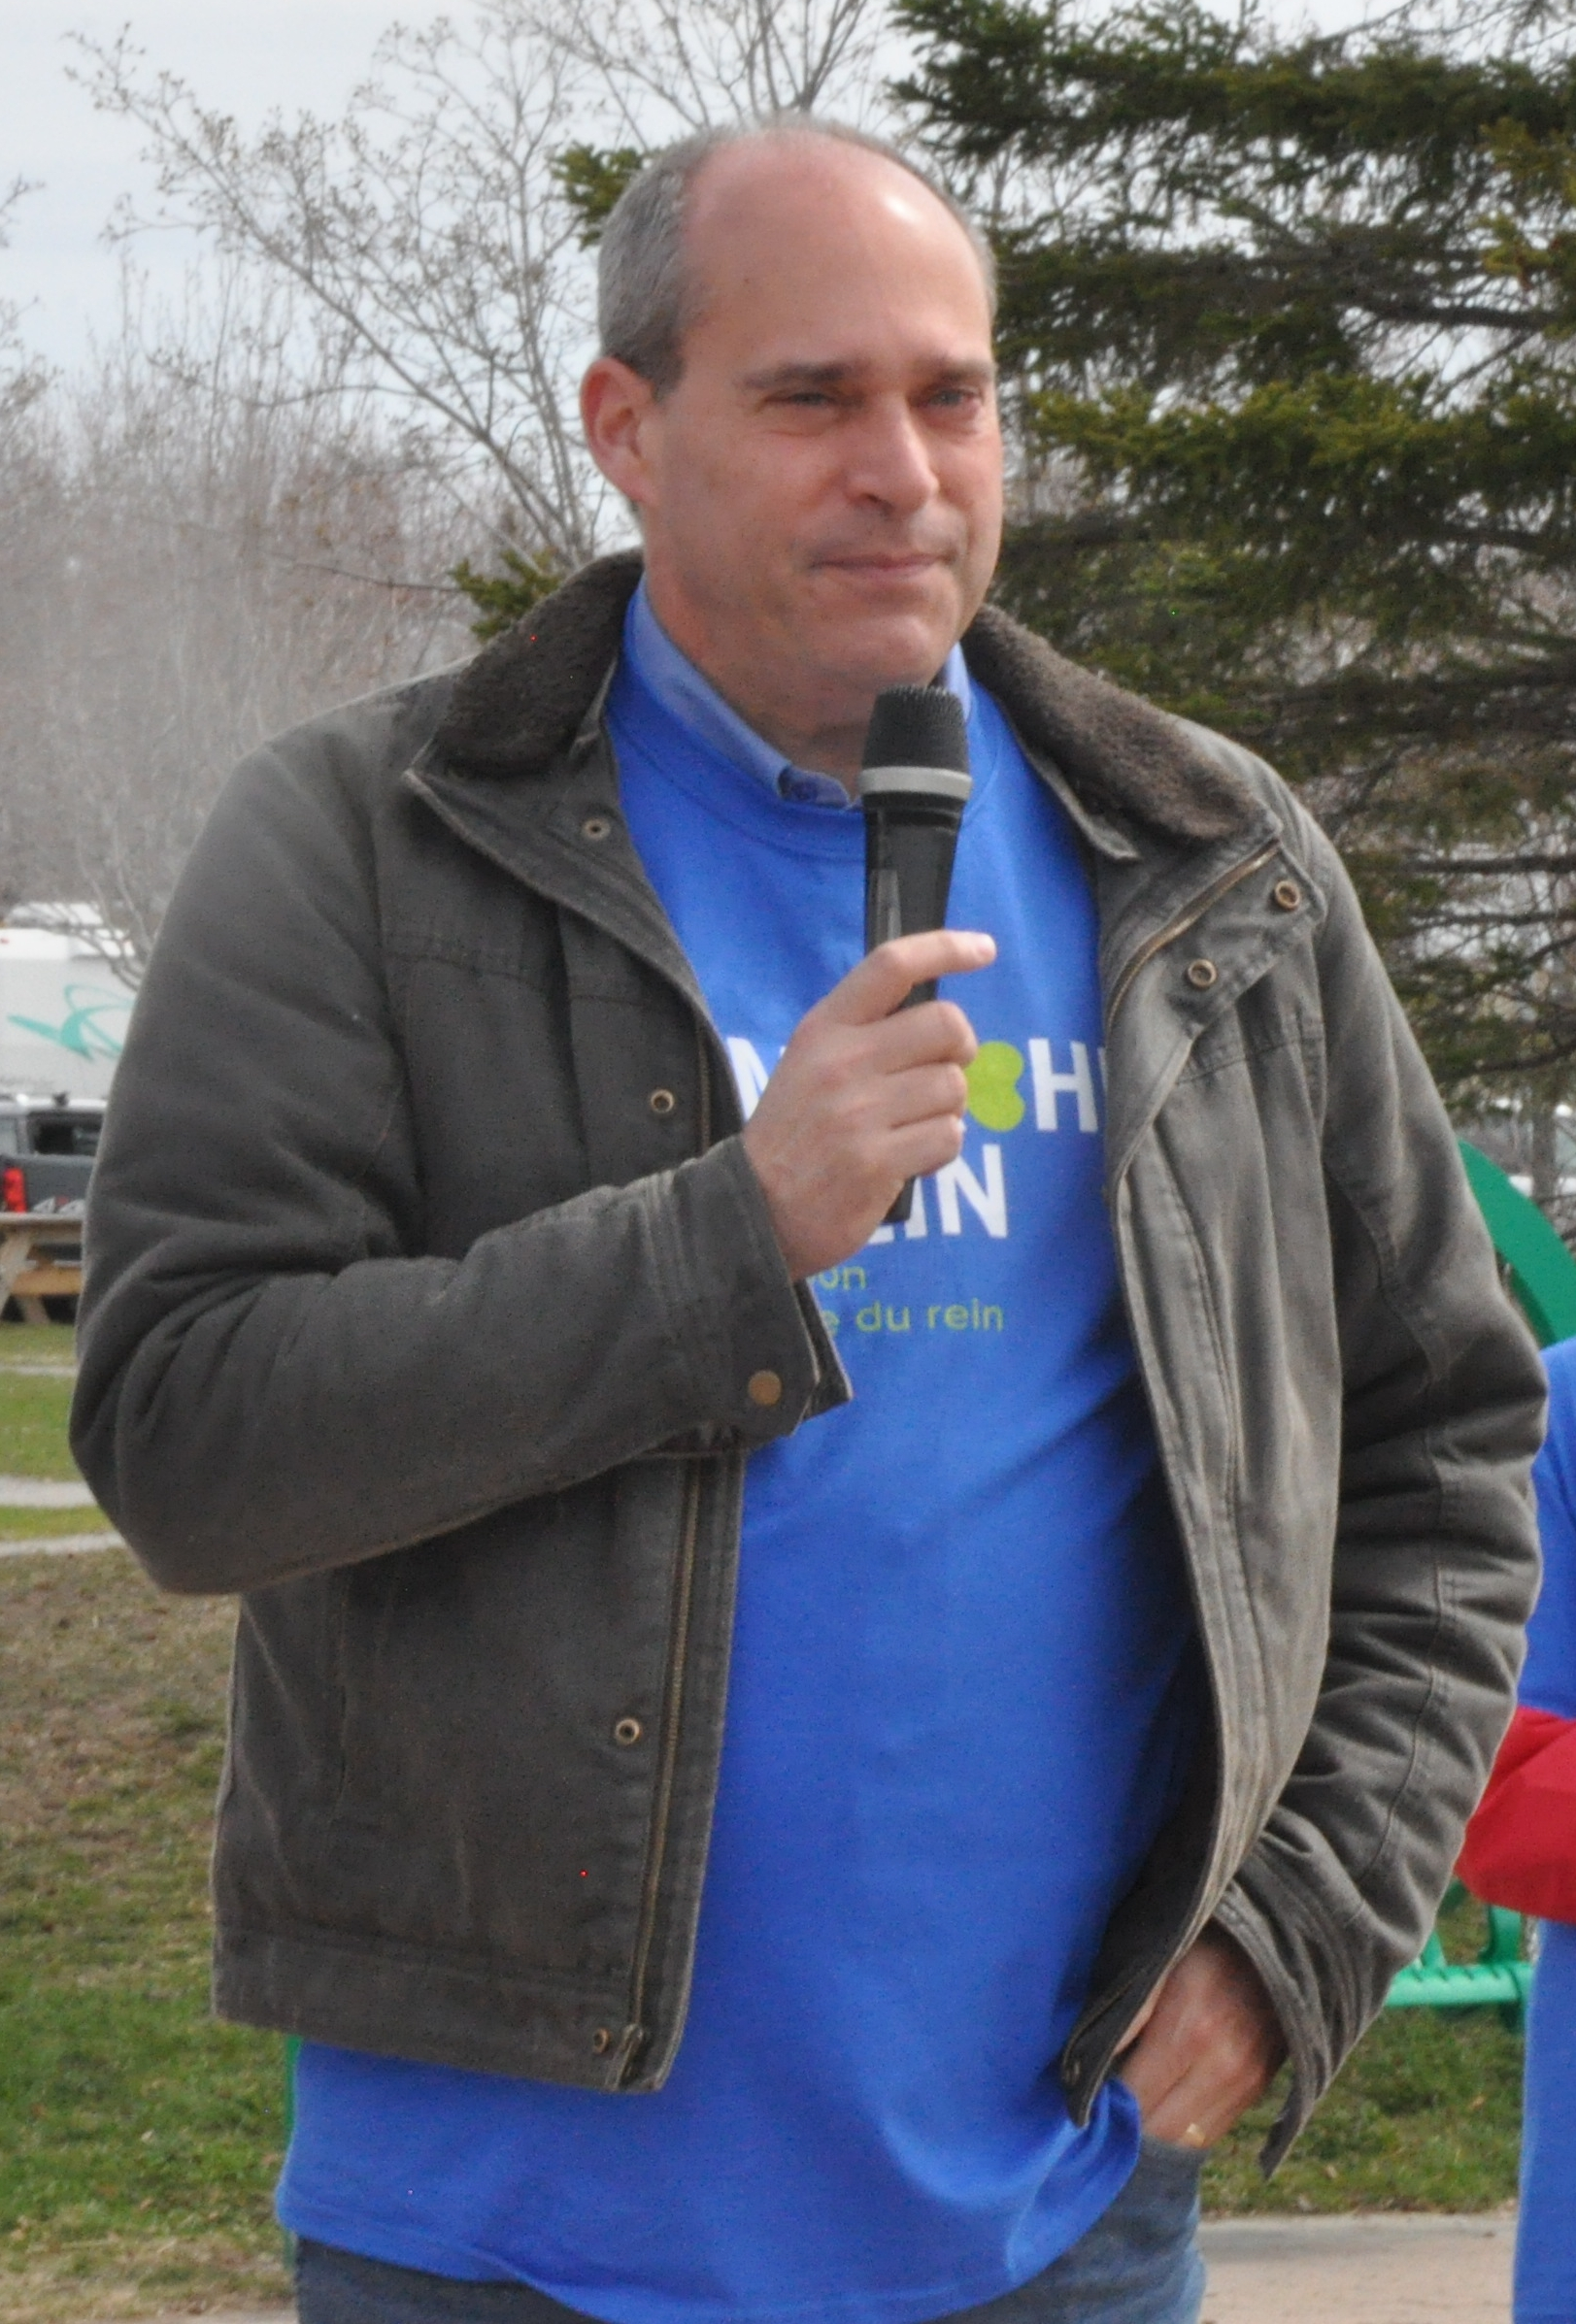 Guy Caron marche reins